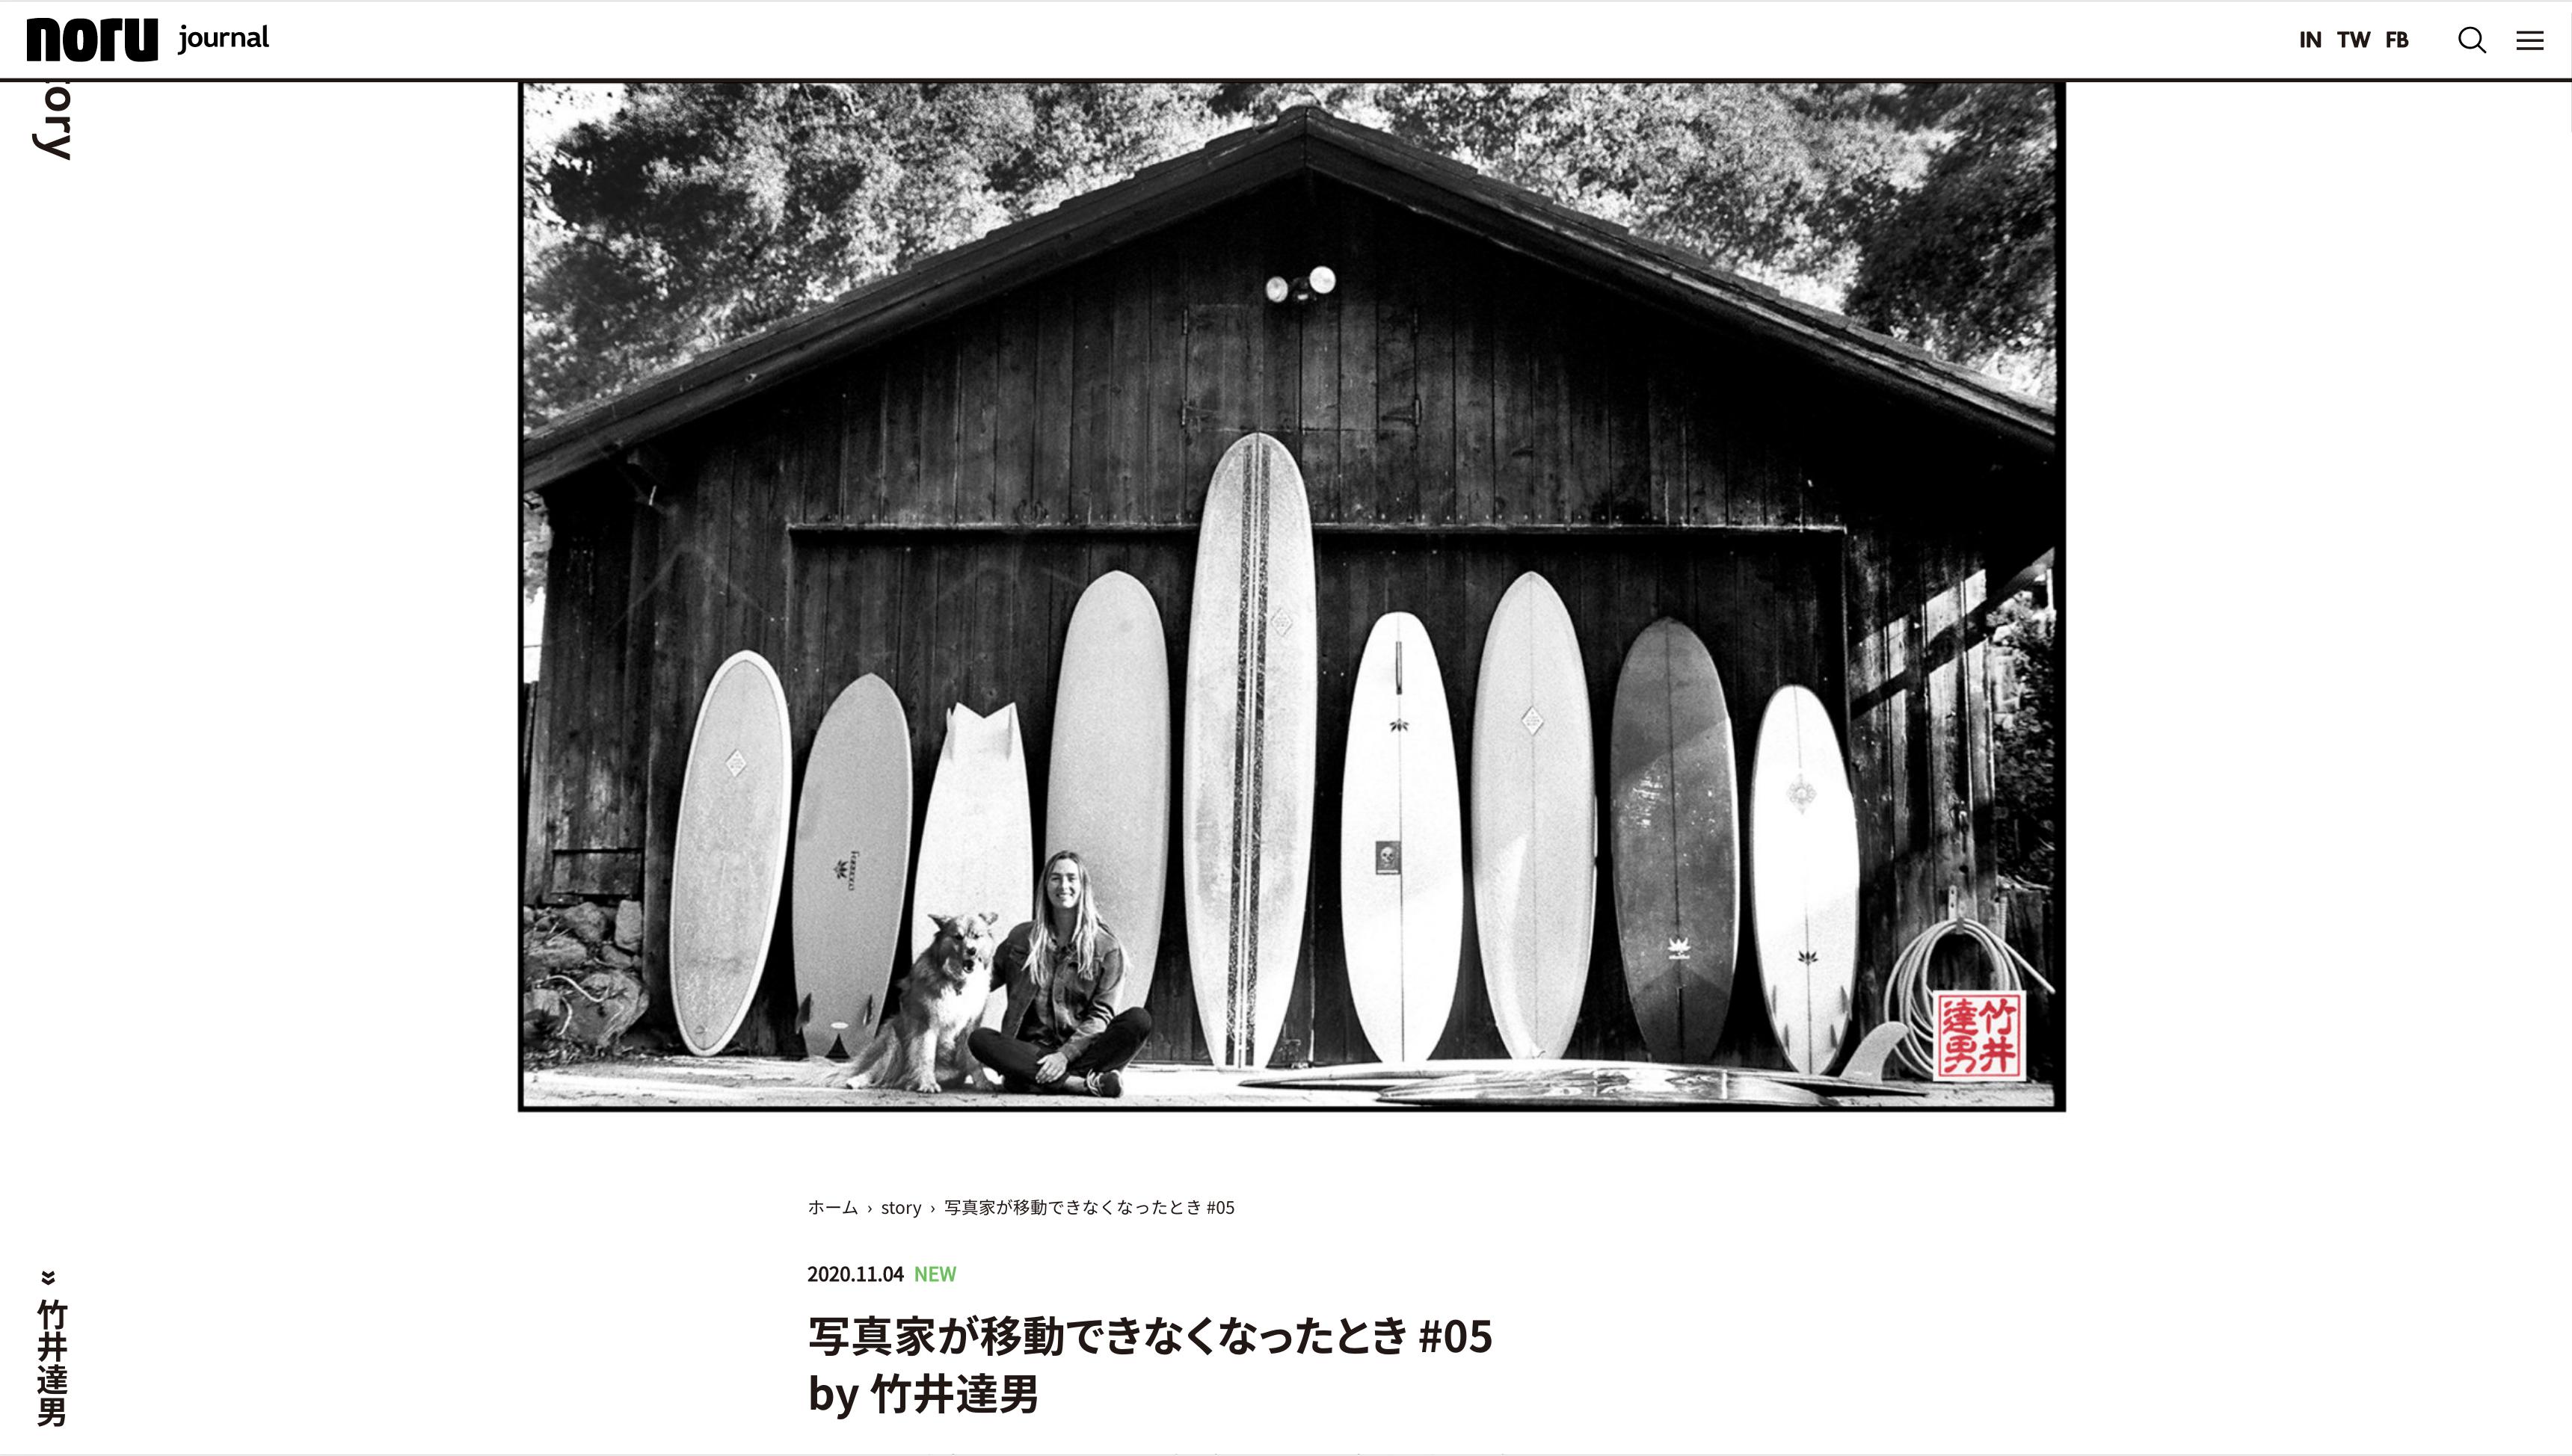 Tatsuo Takei Intervew by noru journal